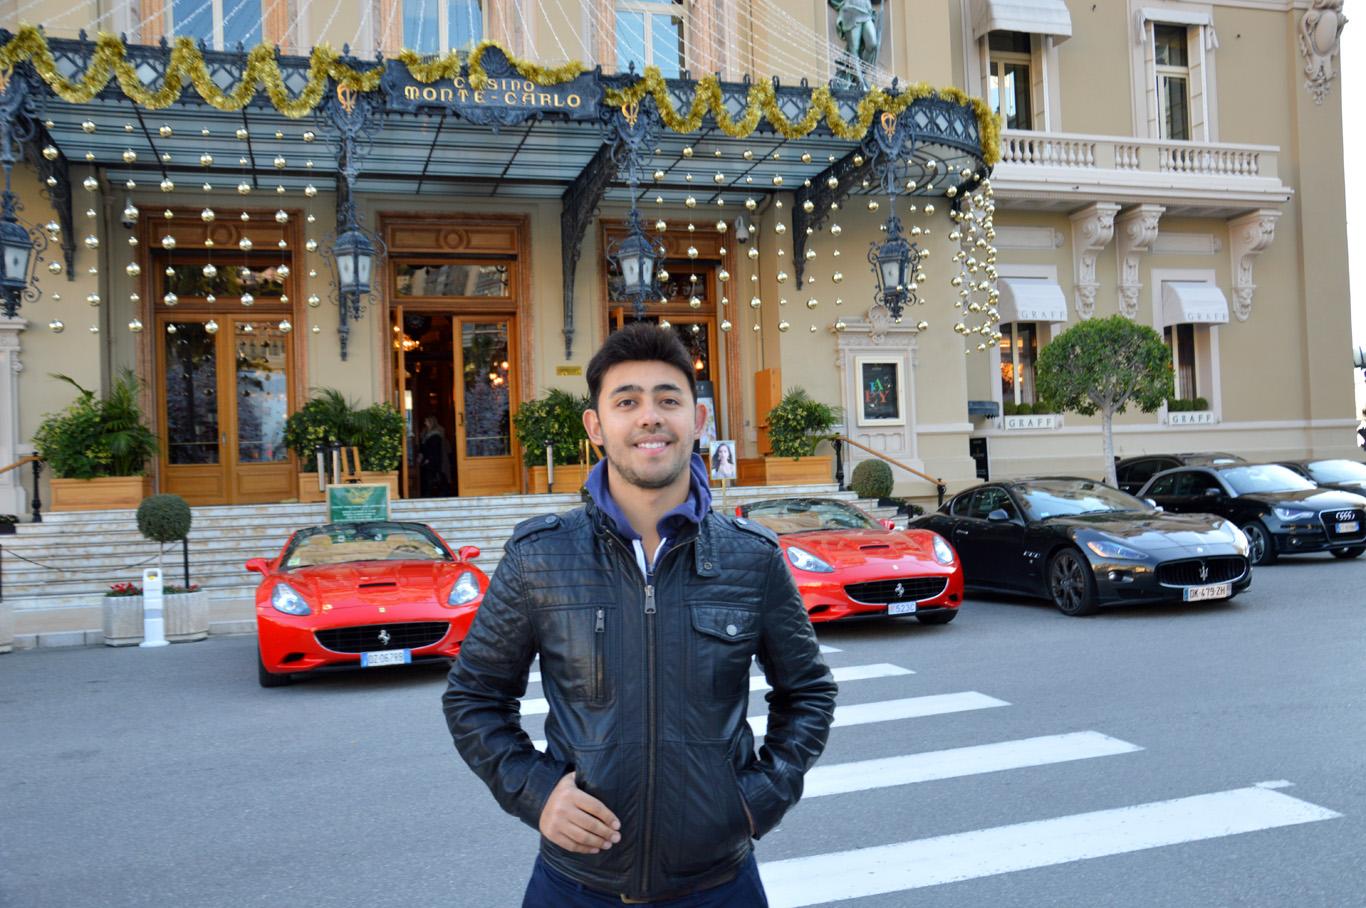 At Gran Casino